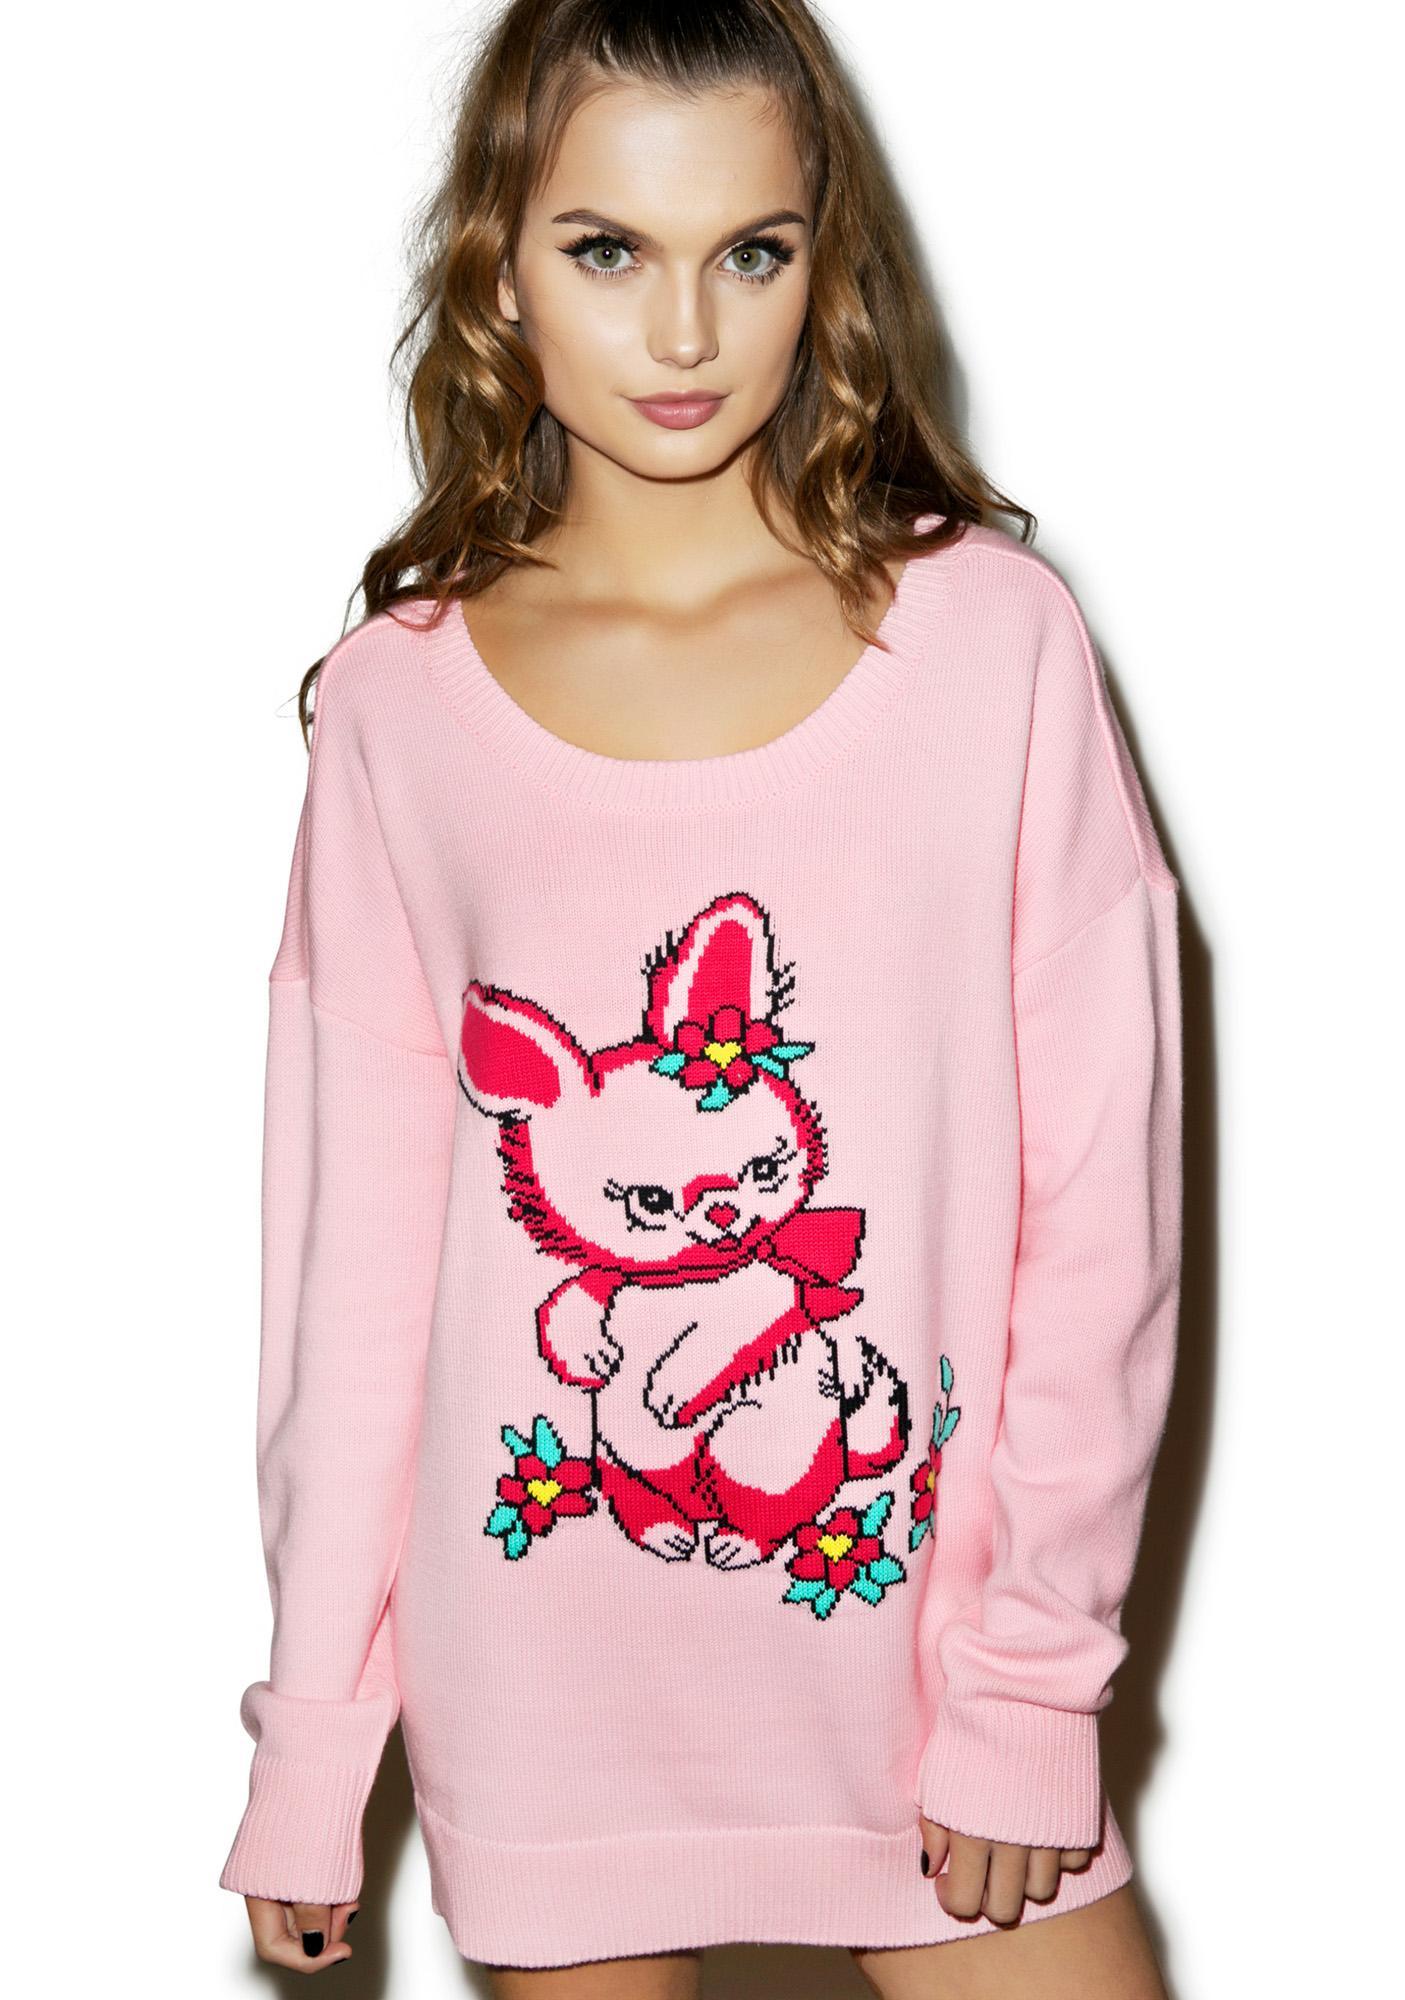 Iron Fist Bunny Bunch Sweater